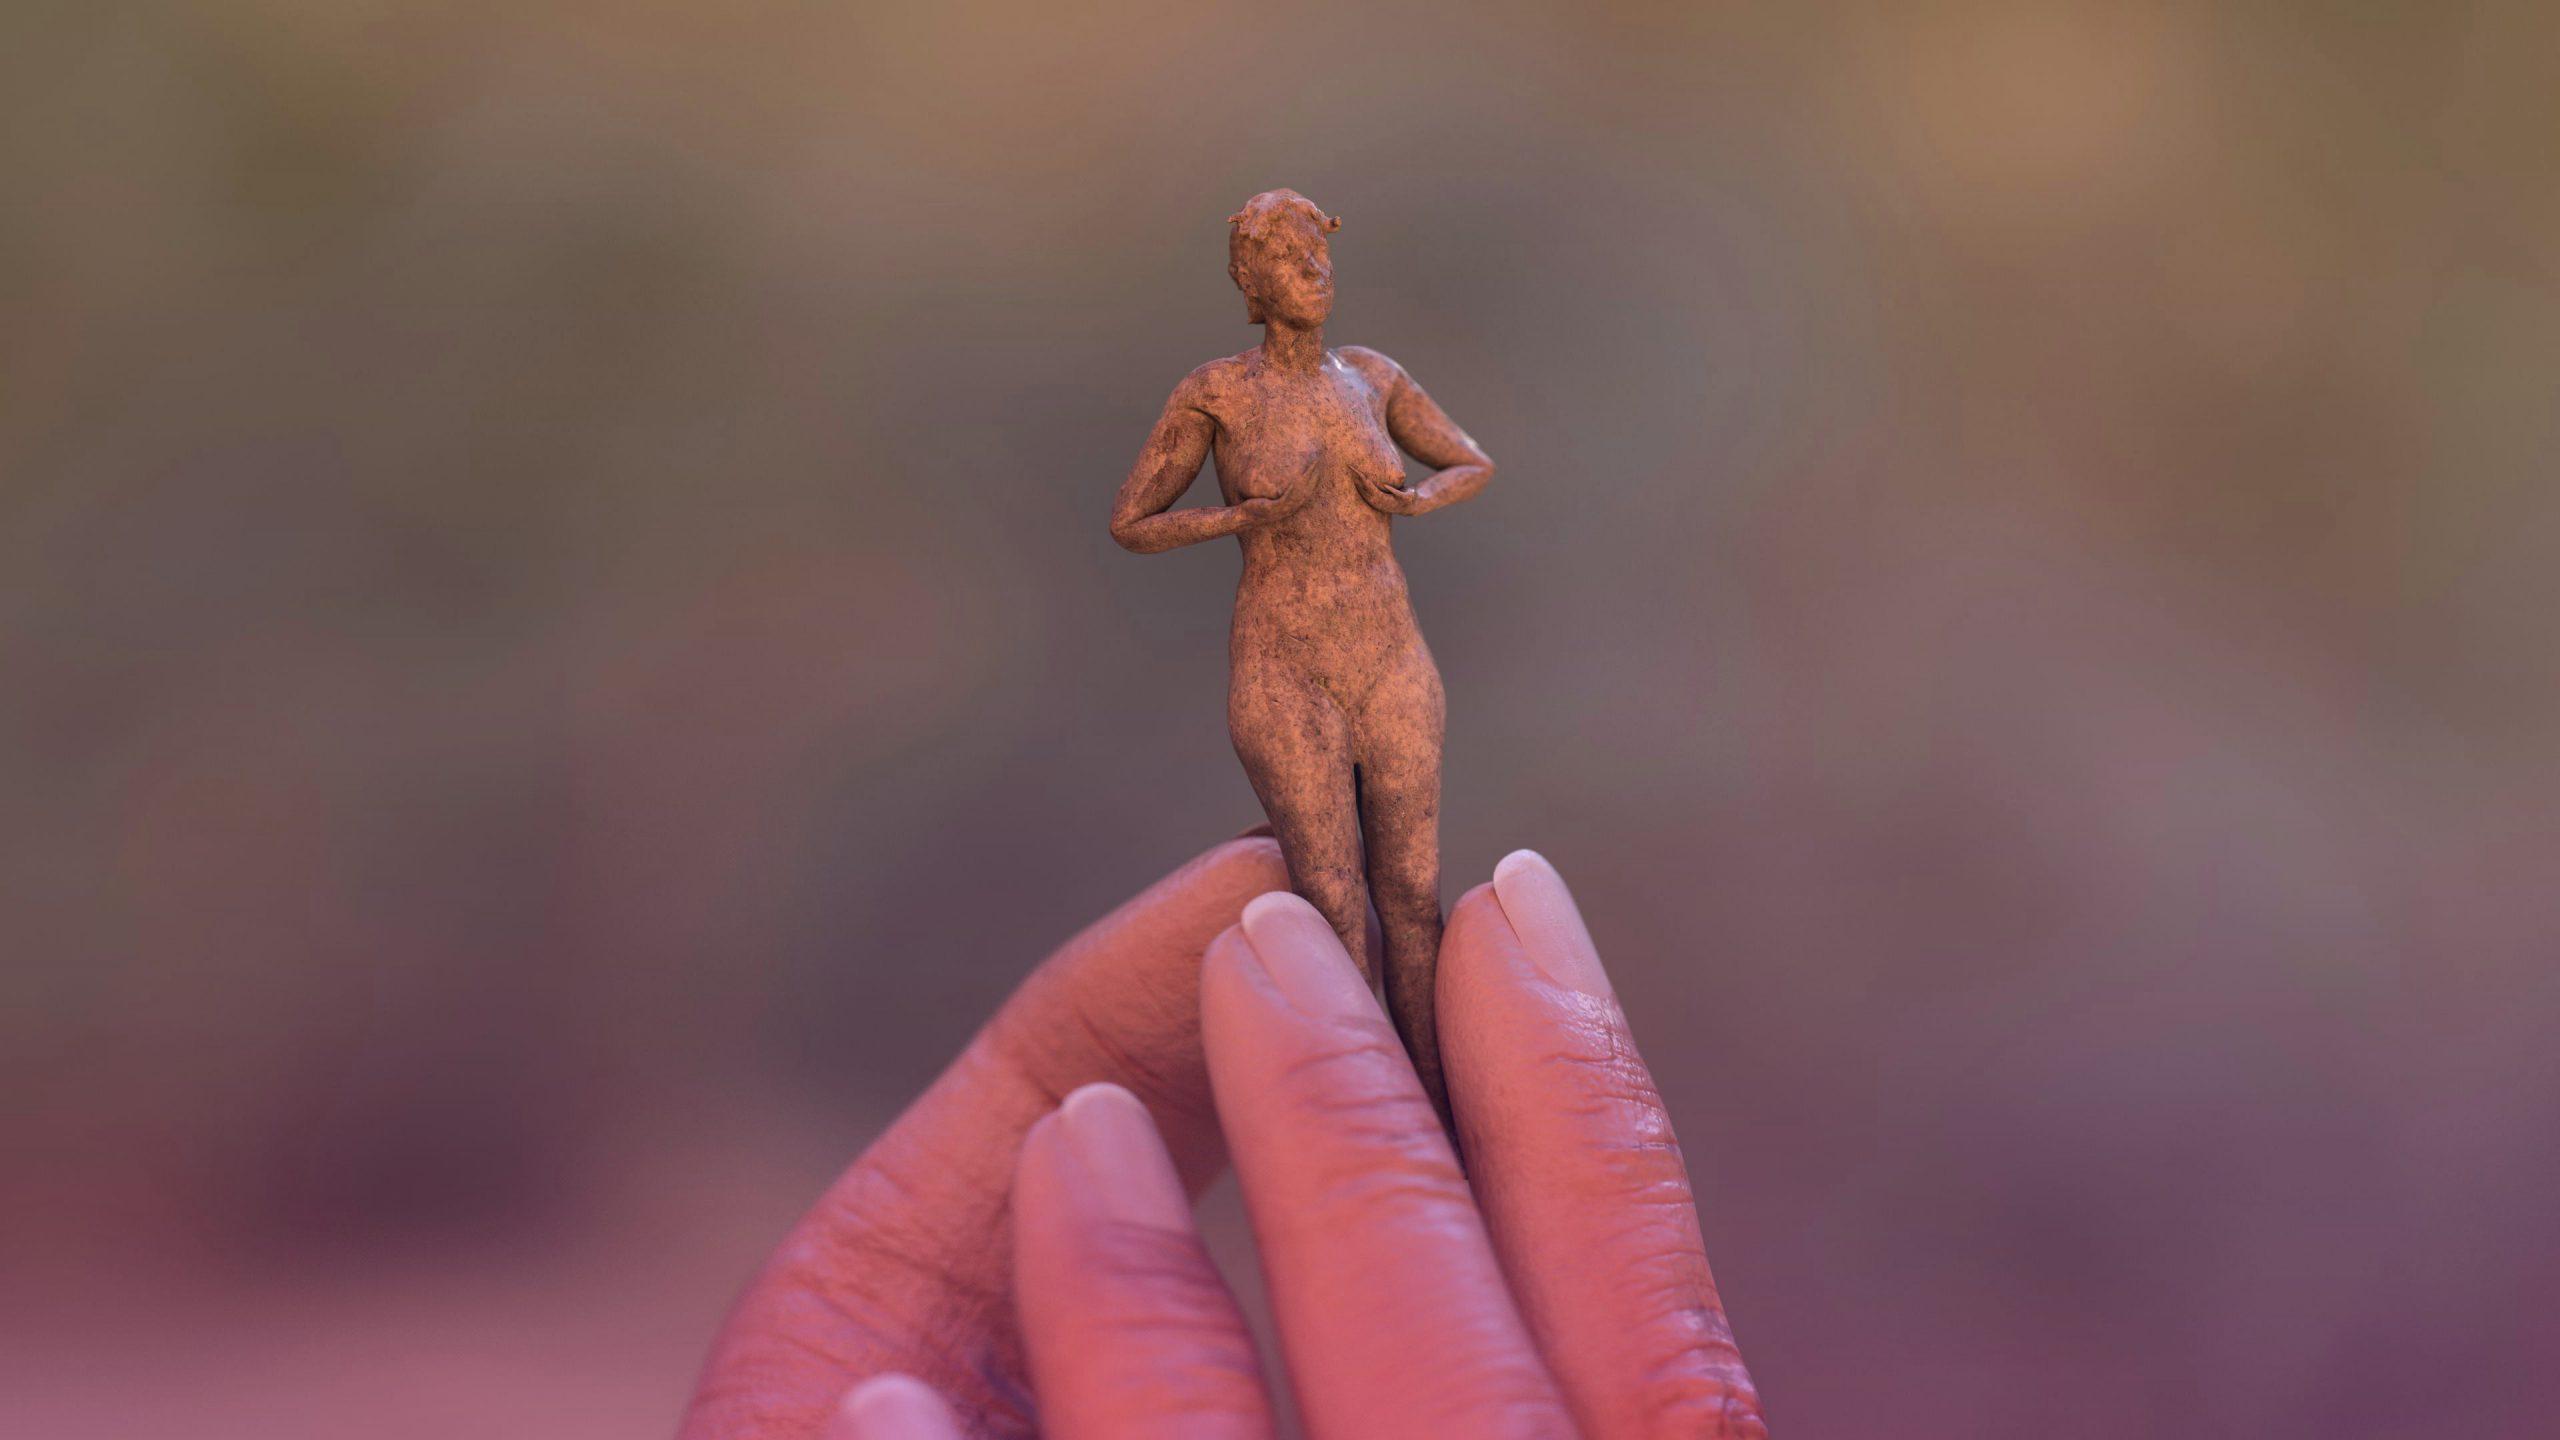 Marry Fuck Kill 2019 3D animation video